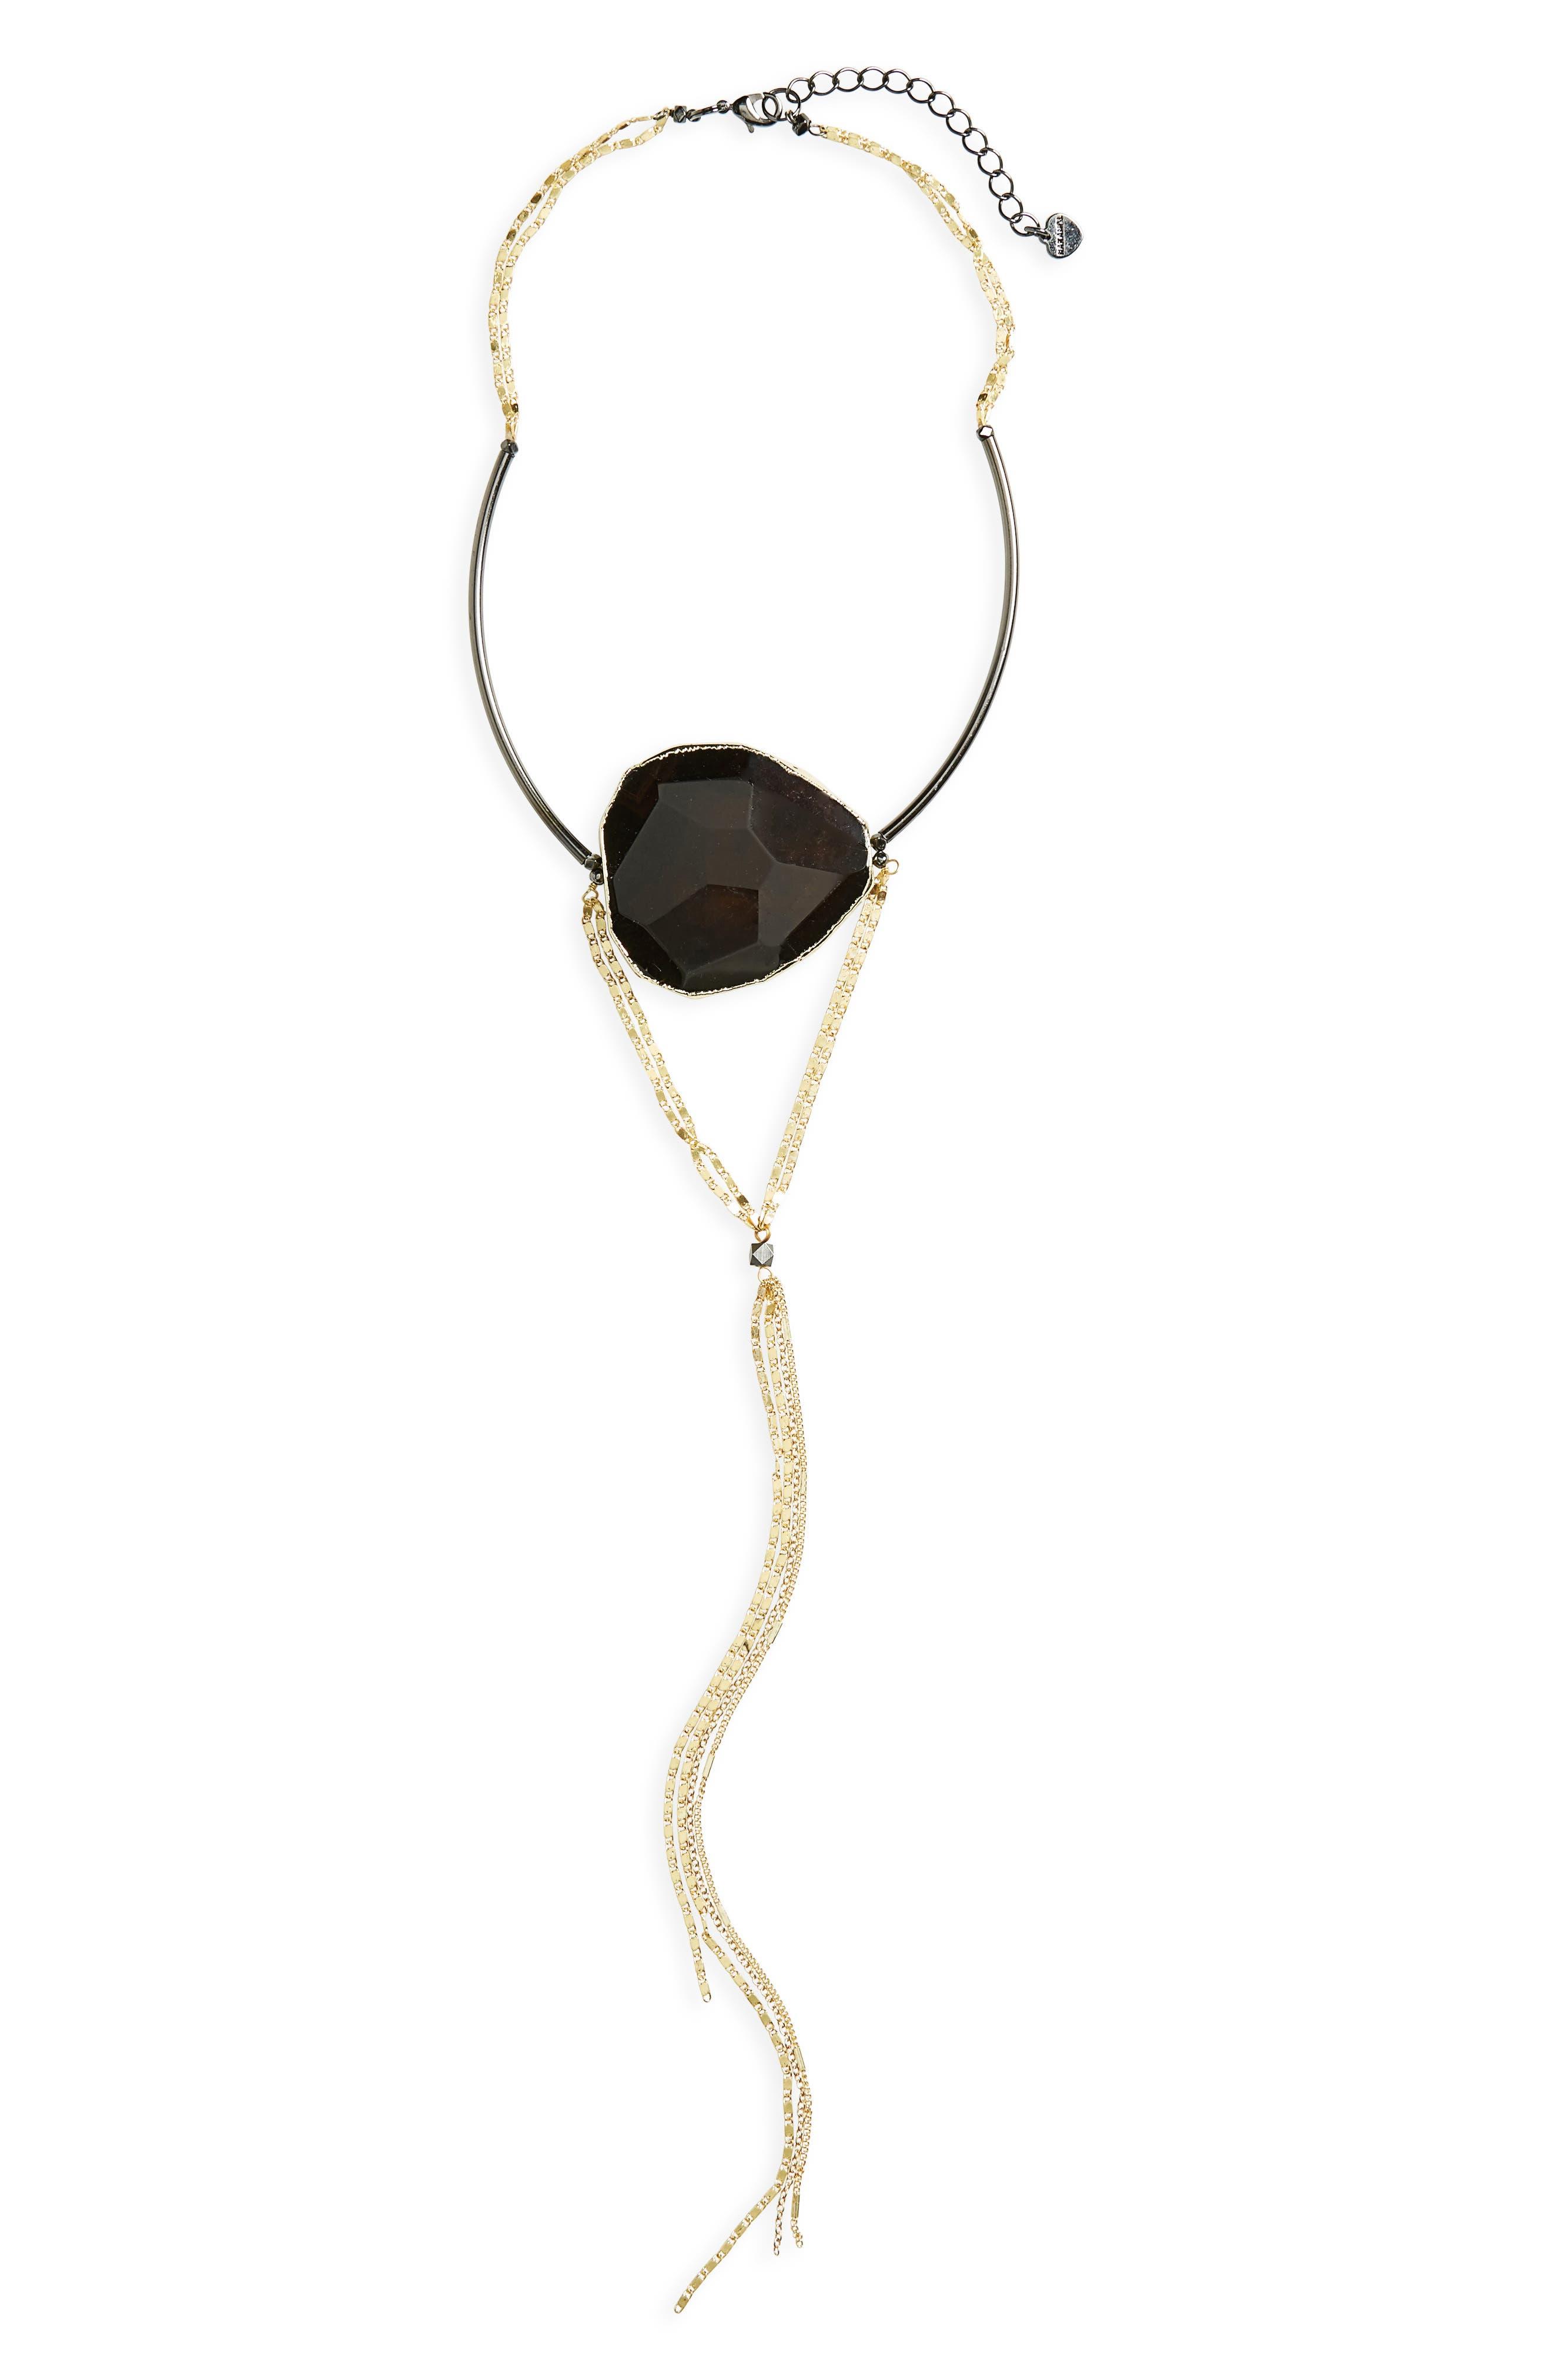 Alternate Image 1 Selected - Nakamol Design Agate Pendant Choker Y-Necklace